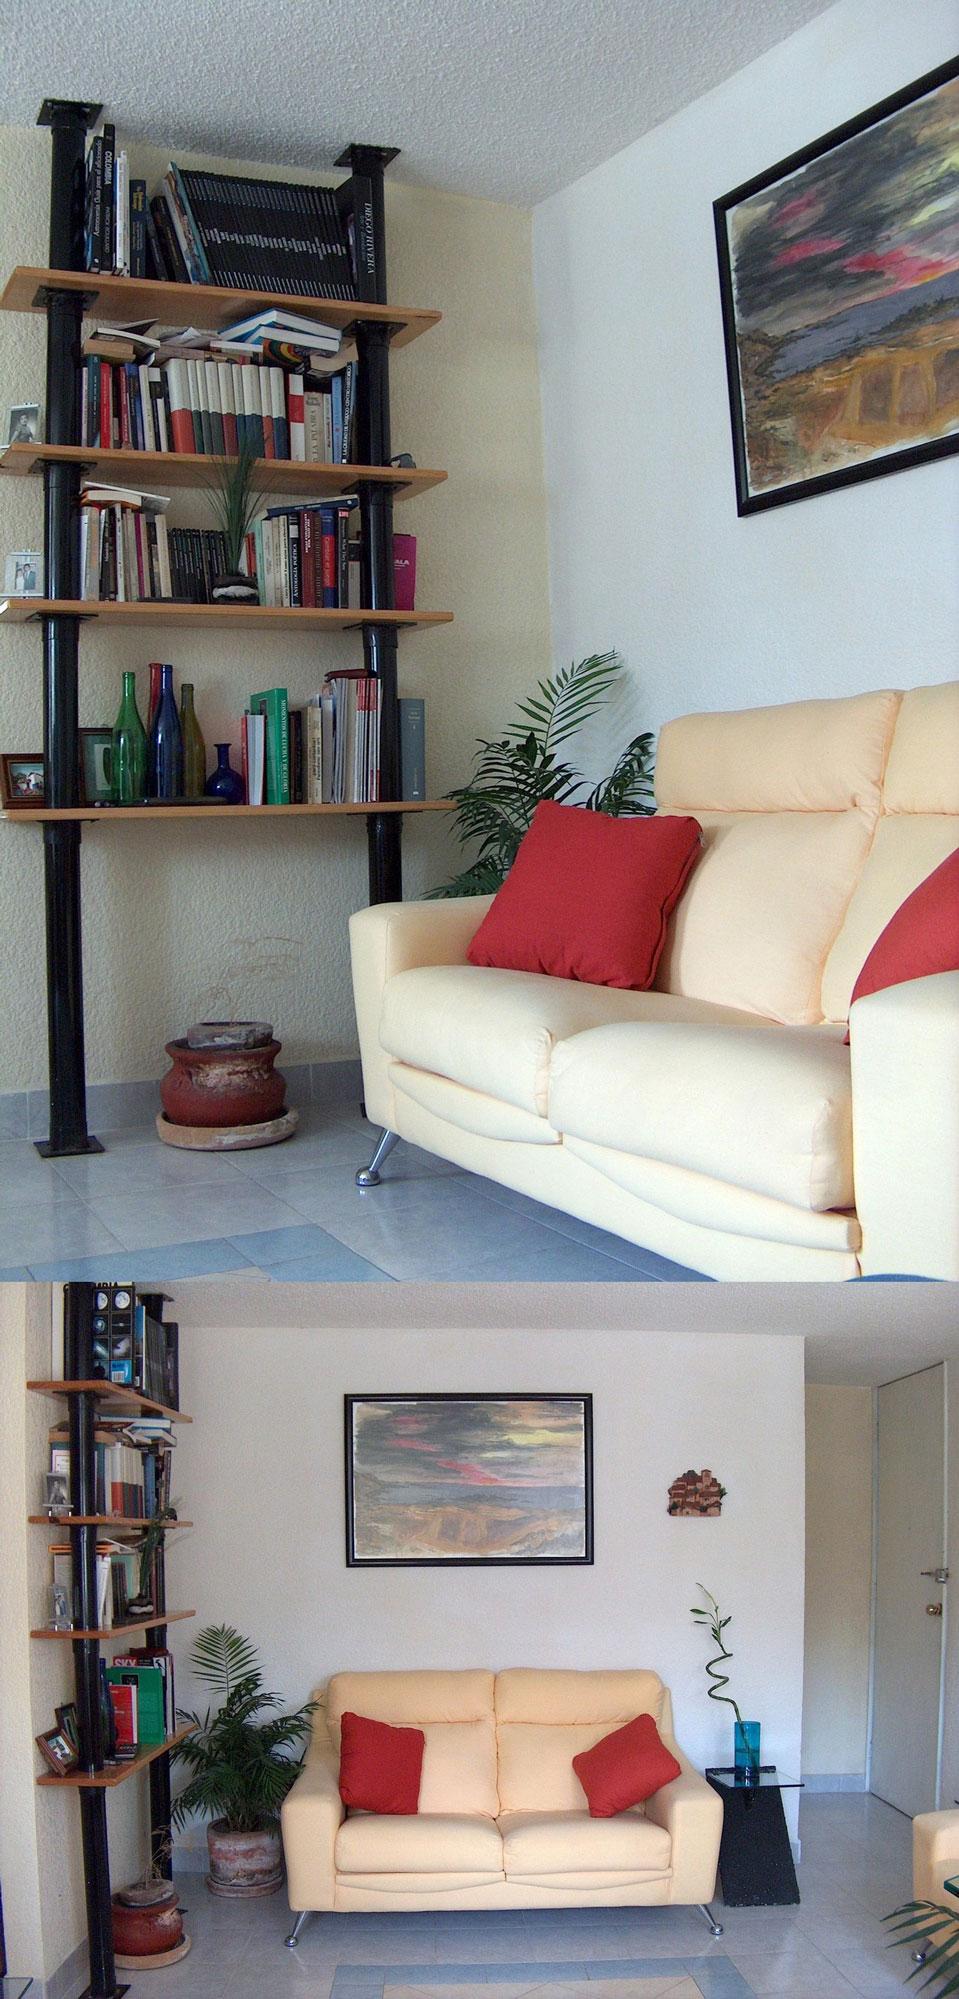 desain-interior-rumah-mungil